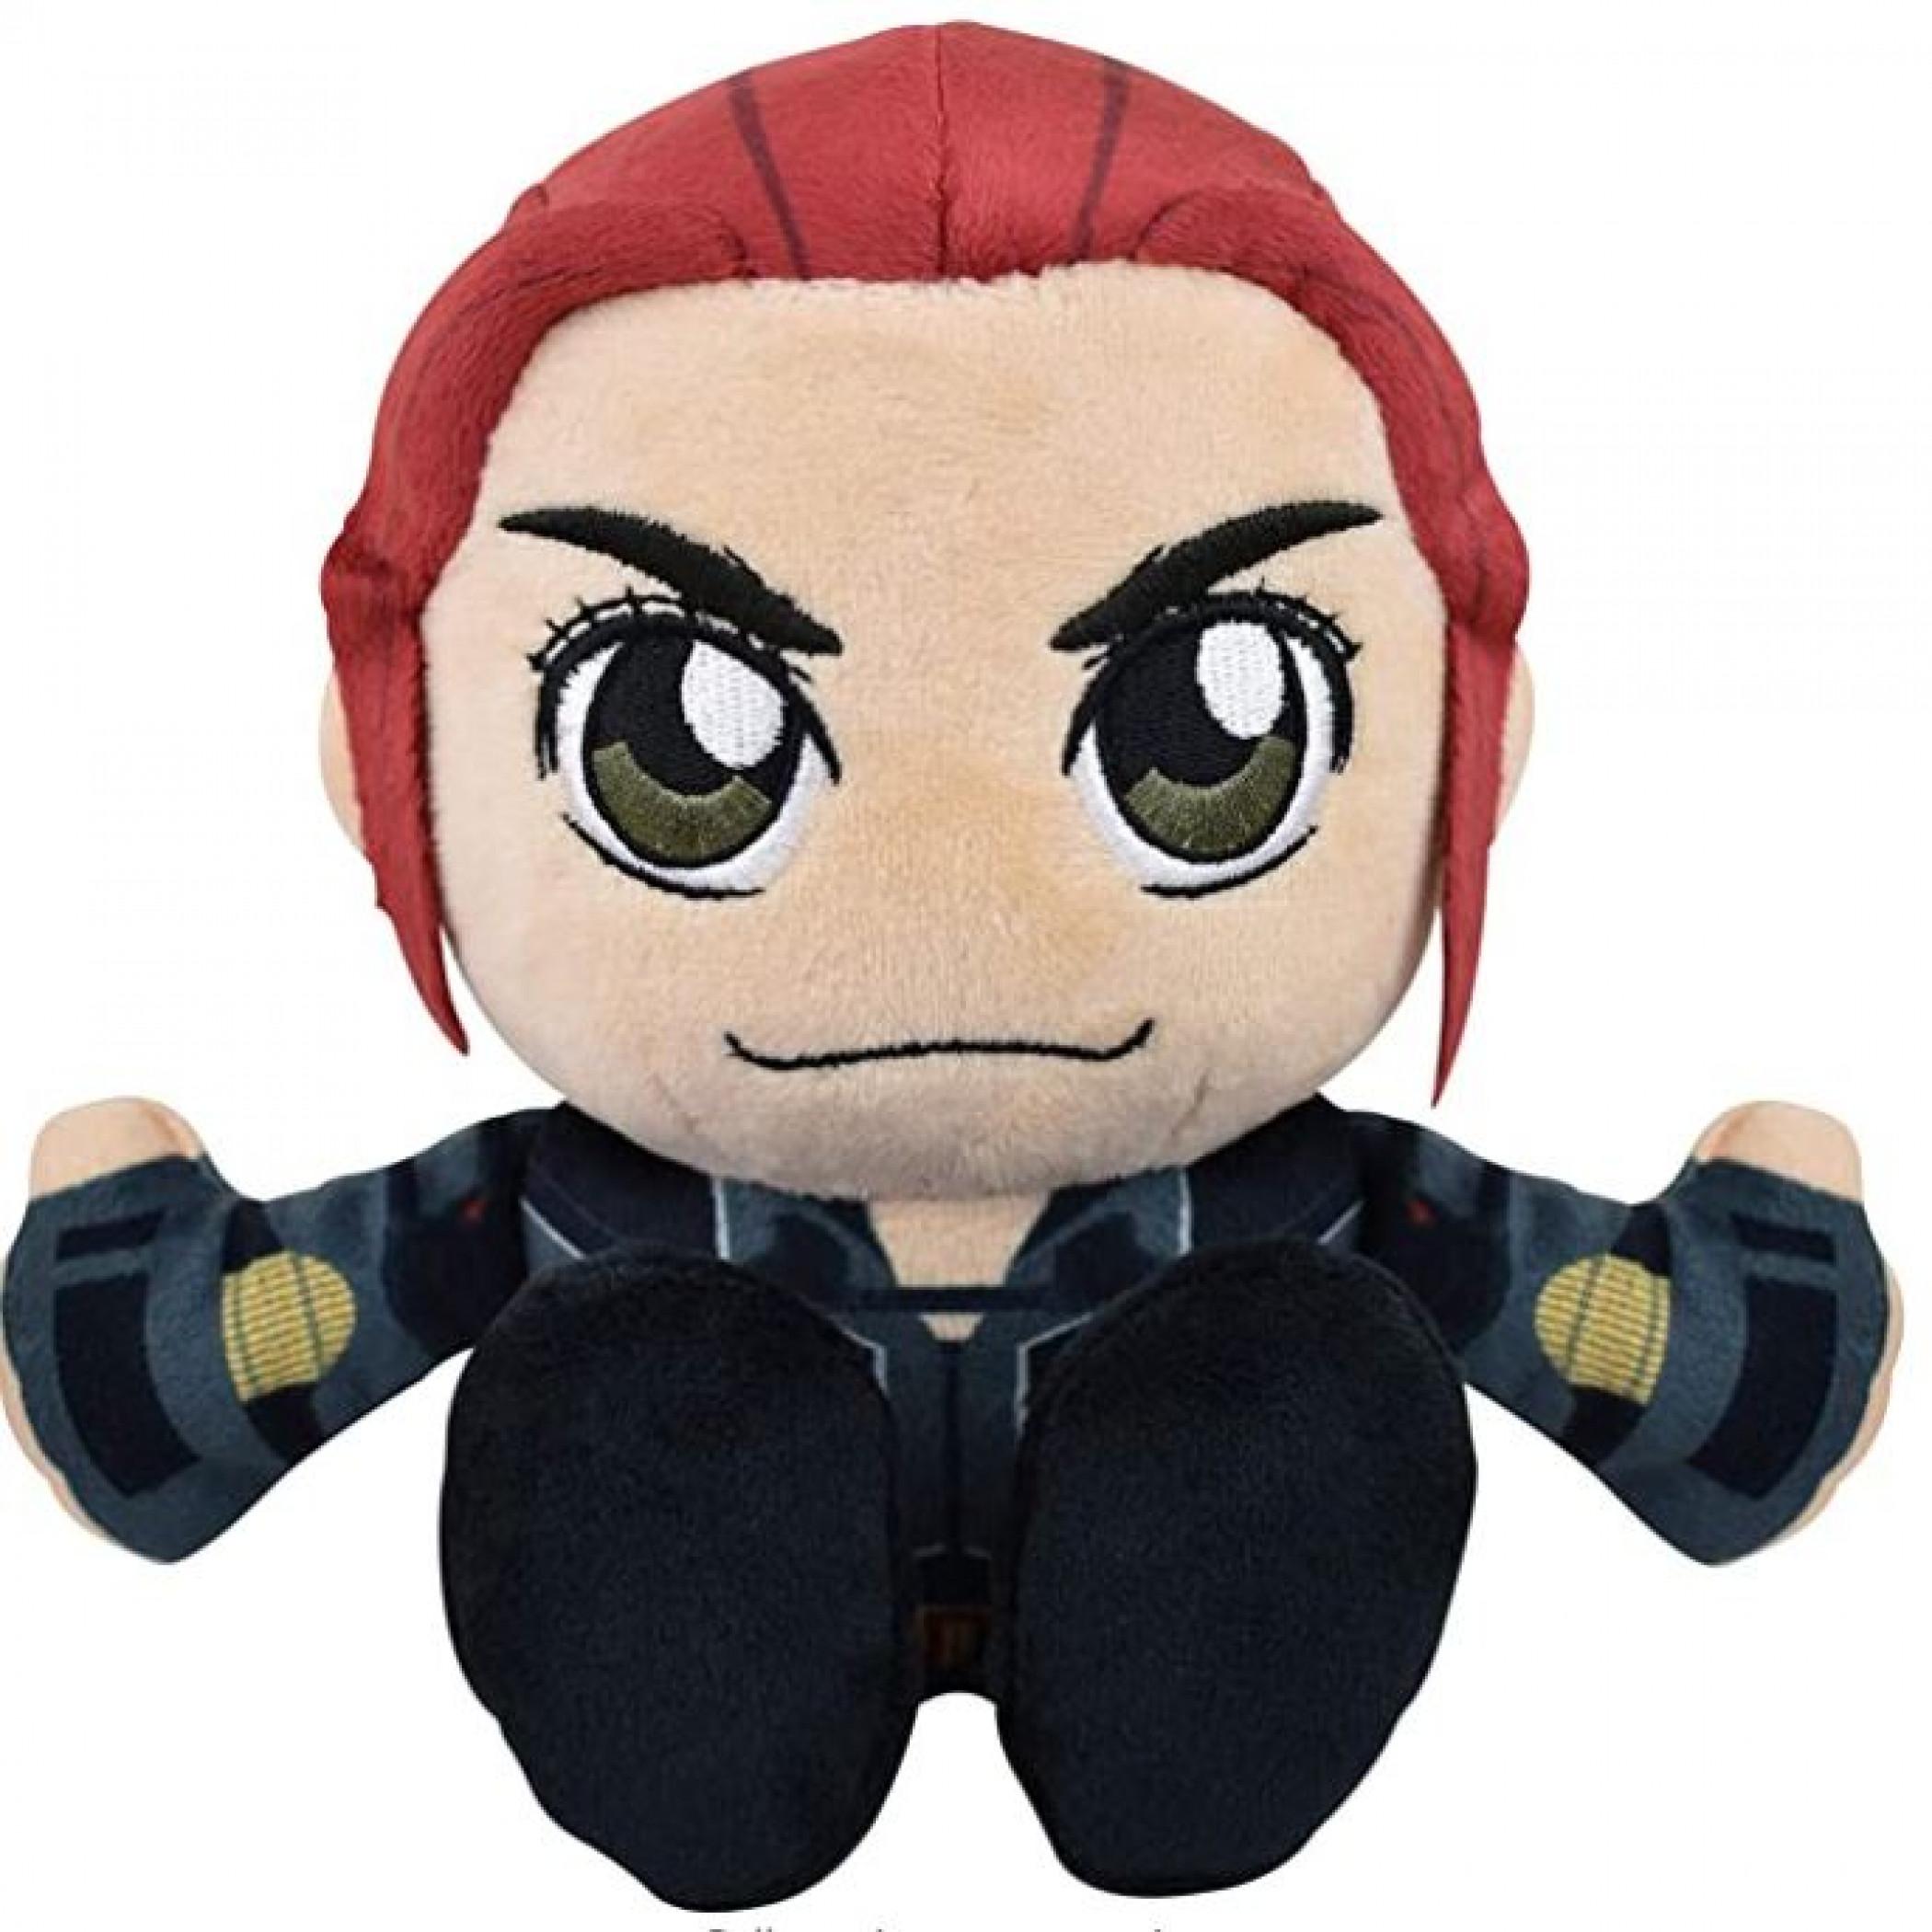 Marvel Black Widow 8 Inch Kuricha Sitting Plush Doll